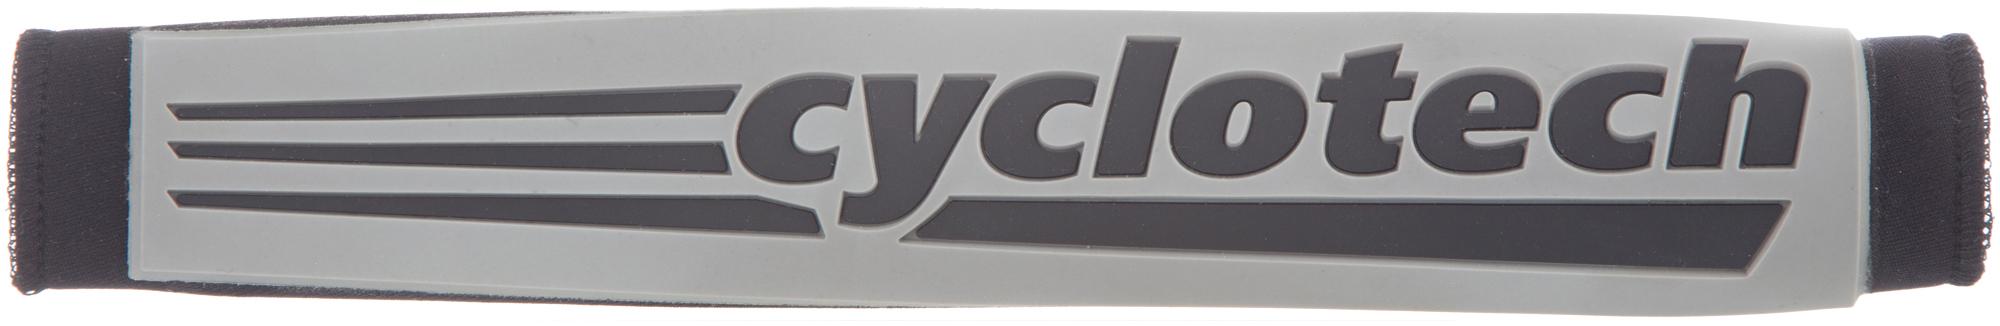 Cyclotech Неопреновая защита перьев Cyclotech asus zenfone 3 zoom 64gb